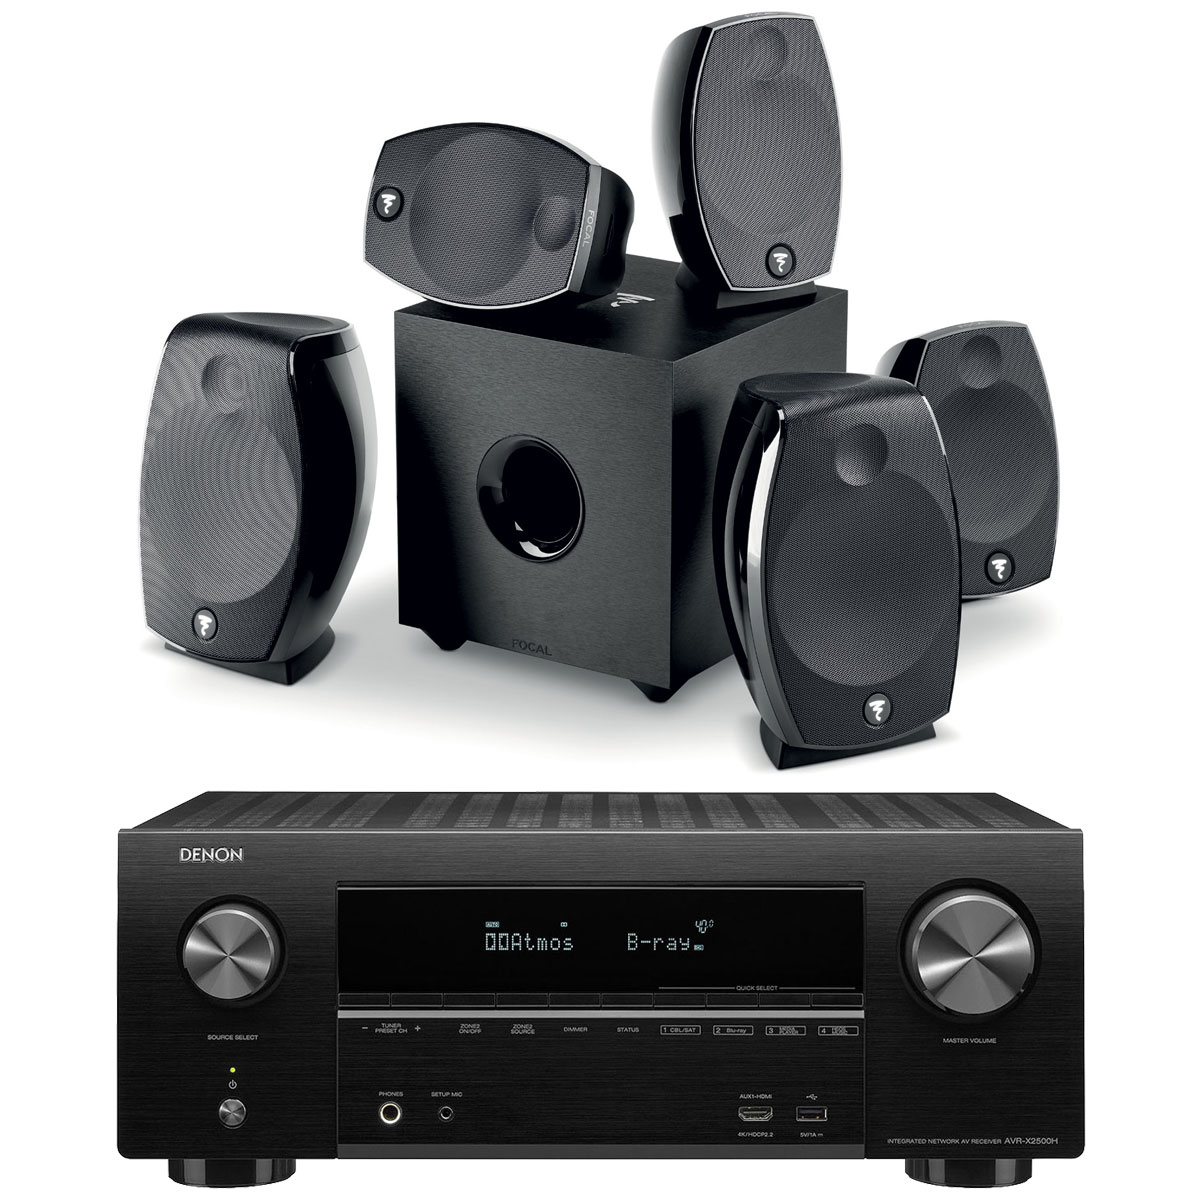 Ensemble home cinéma Denon AVR-X2500H Noir + Focal Sib Evo 5.1.2 Dolby Atmos Ampli-tuner Home Cinema 3D Ready 7.2 - Dolby Atmos / DTS:X - 8x HDMI 4K Ultra HD, HDCP 2.2, HDR - Wi-Fi, Bluetooth, AirPlay 2 - Multiroom - Amazon Alexa + Pack d'enceintes 5.1.2